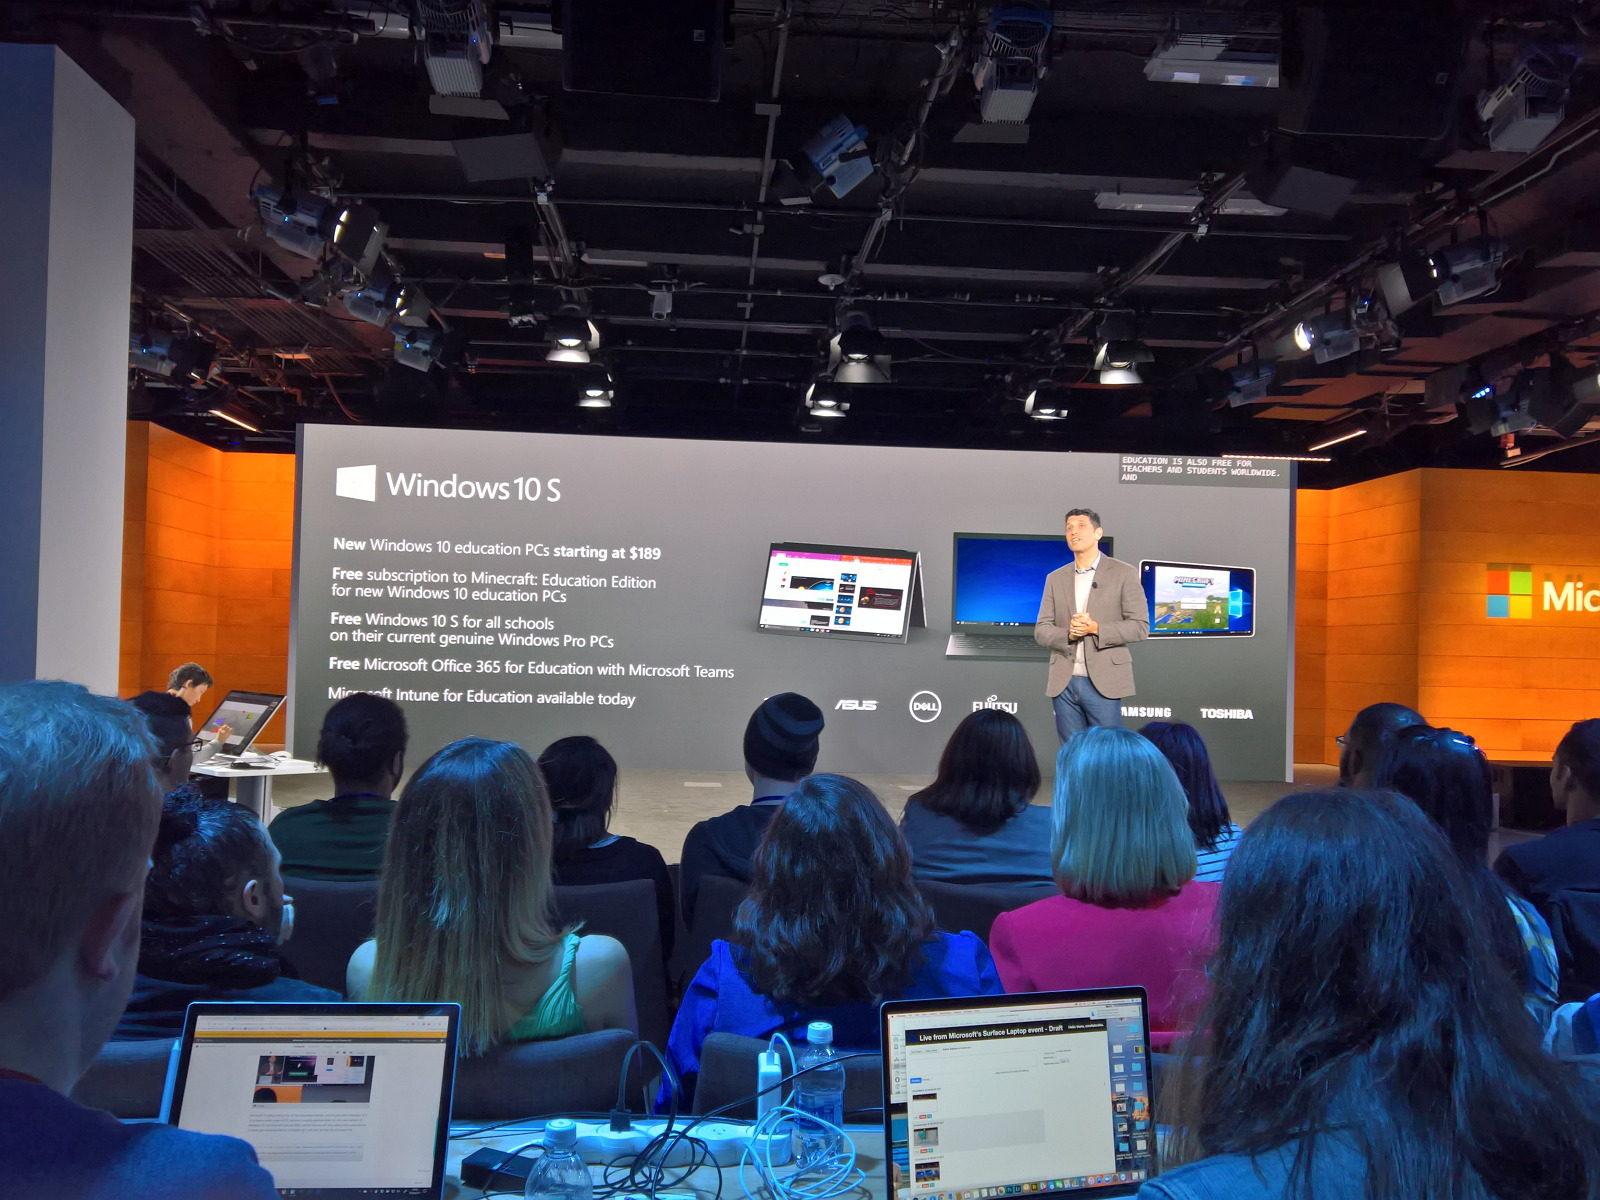 MicrosoftEDU event recap: Surface Laptop, Windows 10 S, and